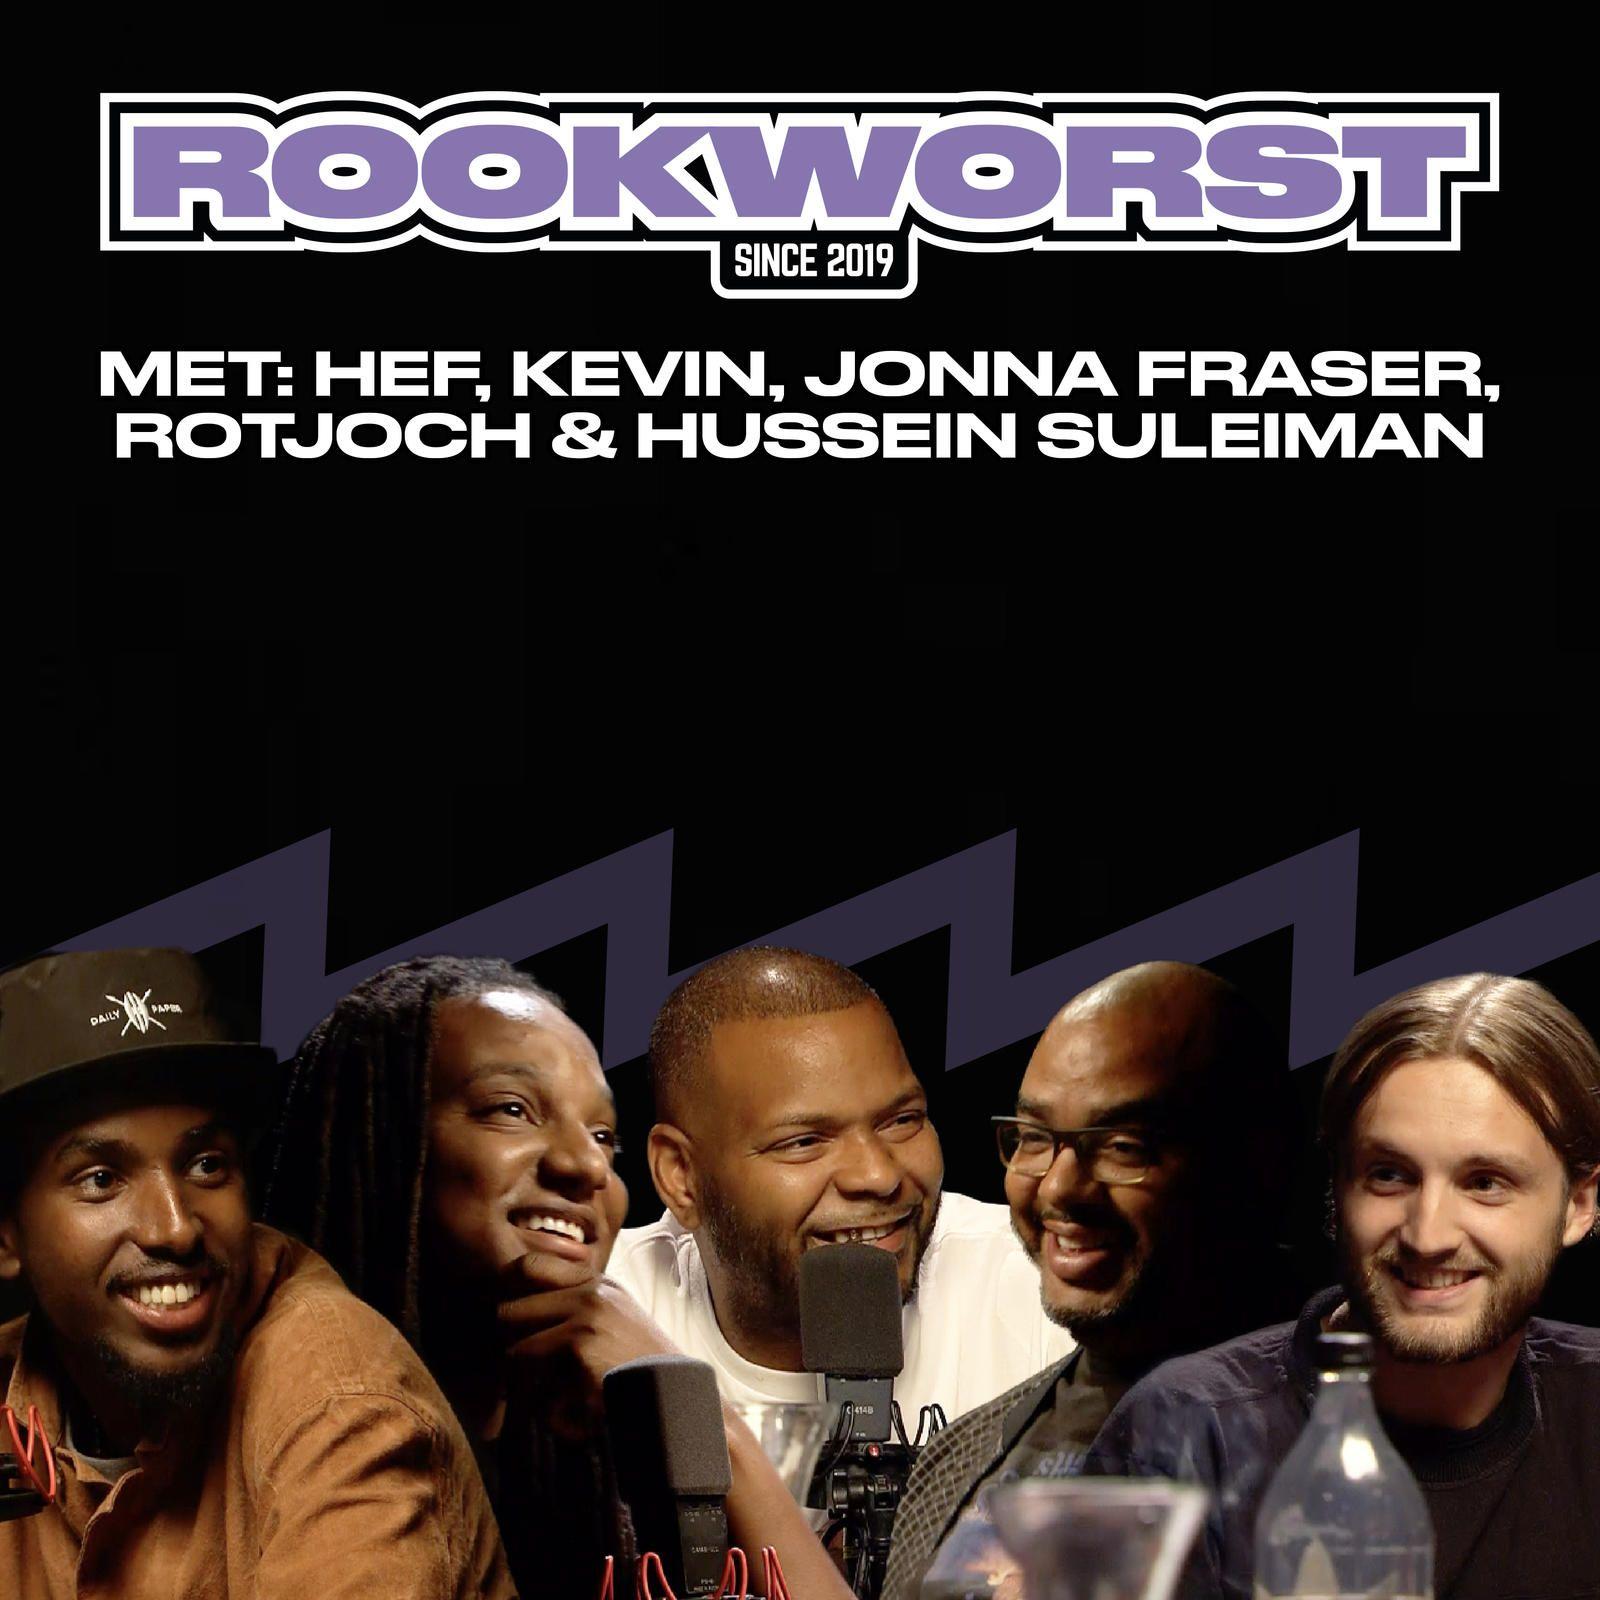 3: Ep. 3 met HEF, KEVIN, JONNA FRASER, ROTJOCH & HUSSEIN (DAILY PAPER)